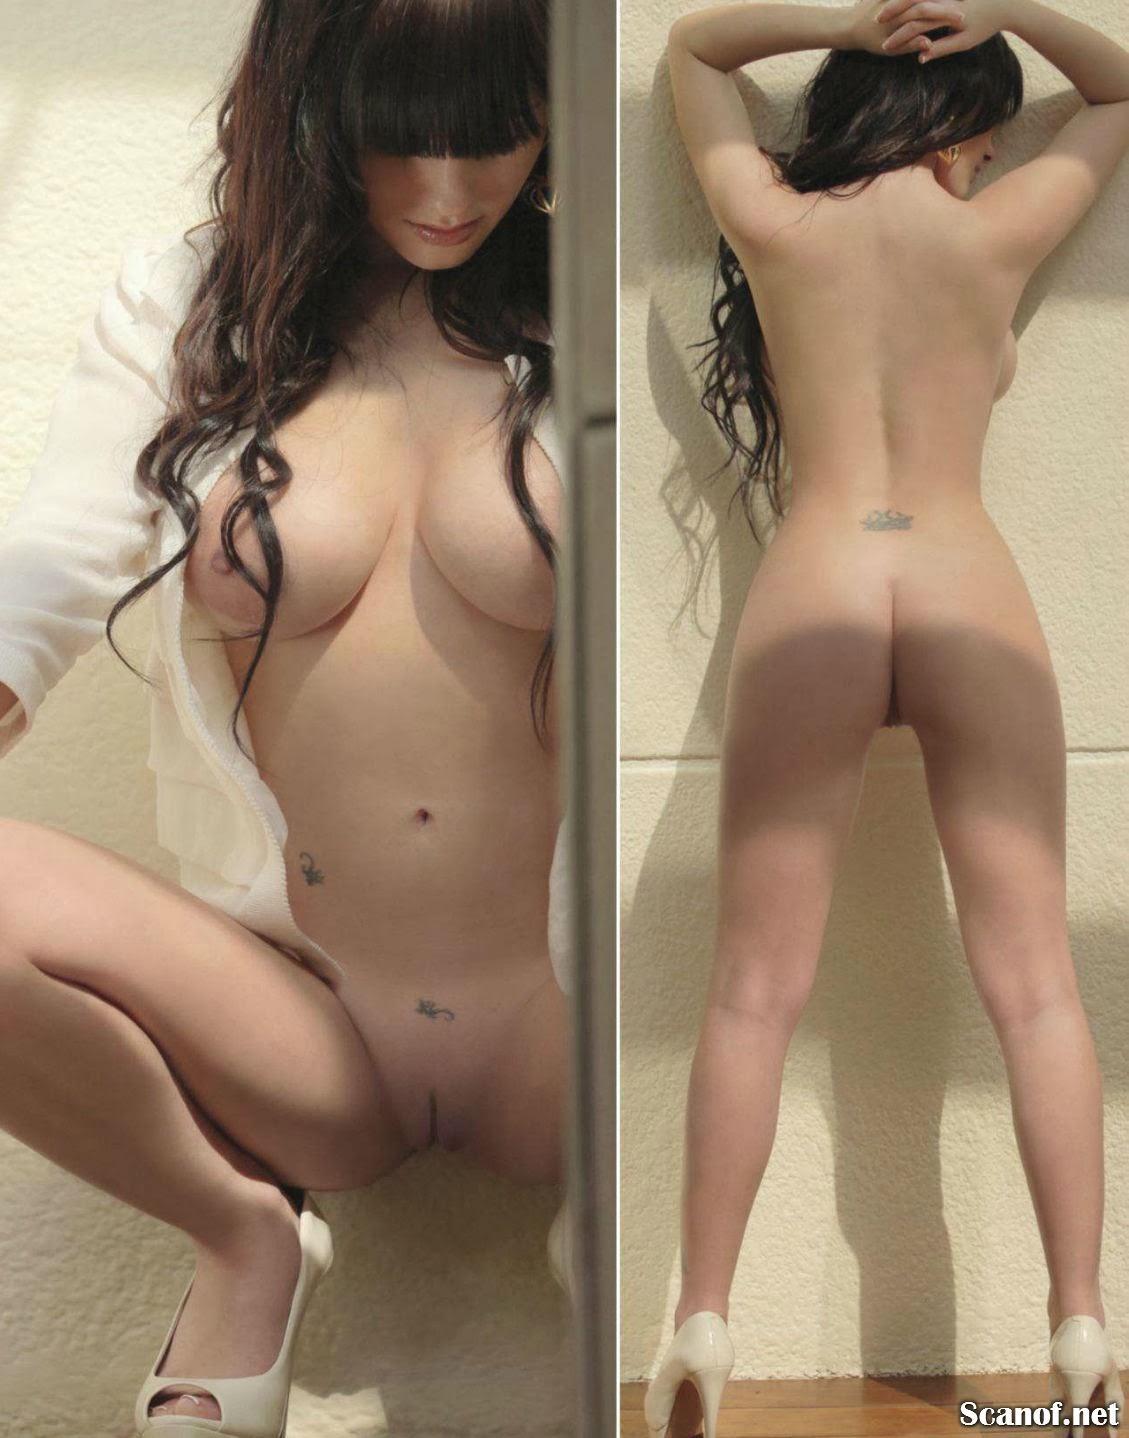 http://3.bp.blogspot.com/-qYbPMQtwltM/UrWs0Ne77WI/AAAAAAAAyUo/2bQKGDO3q38/s1600/04.jpg